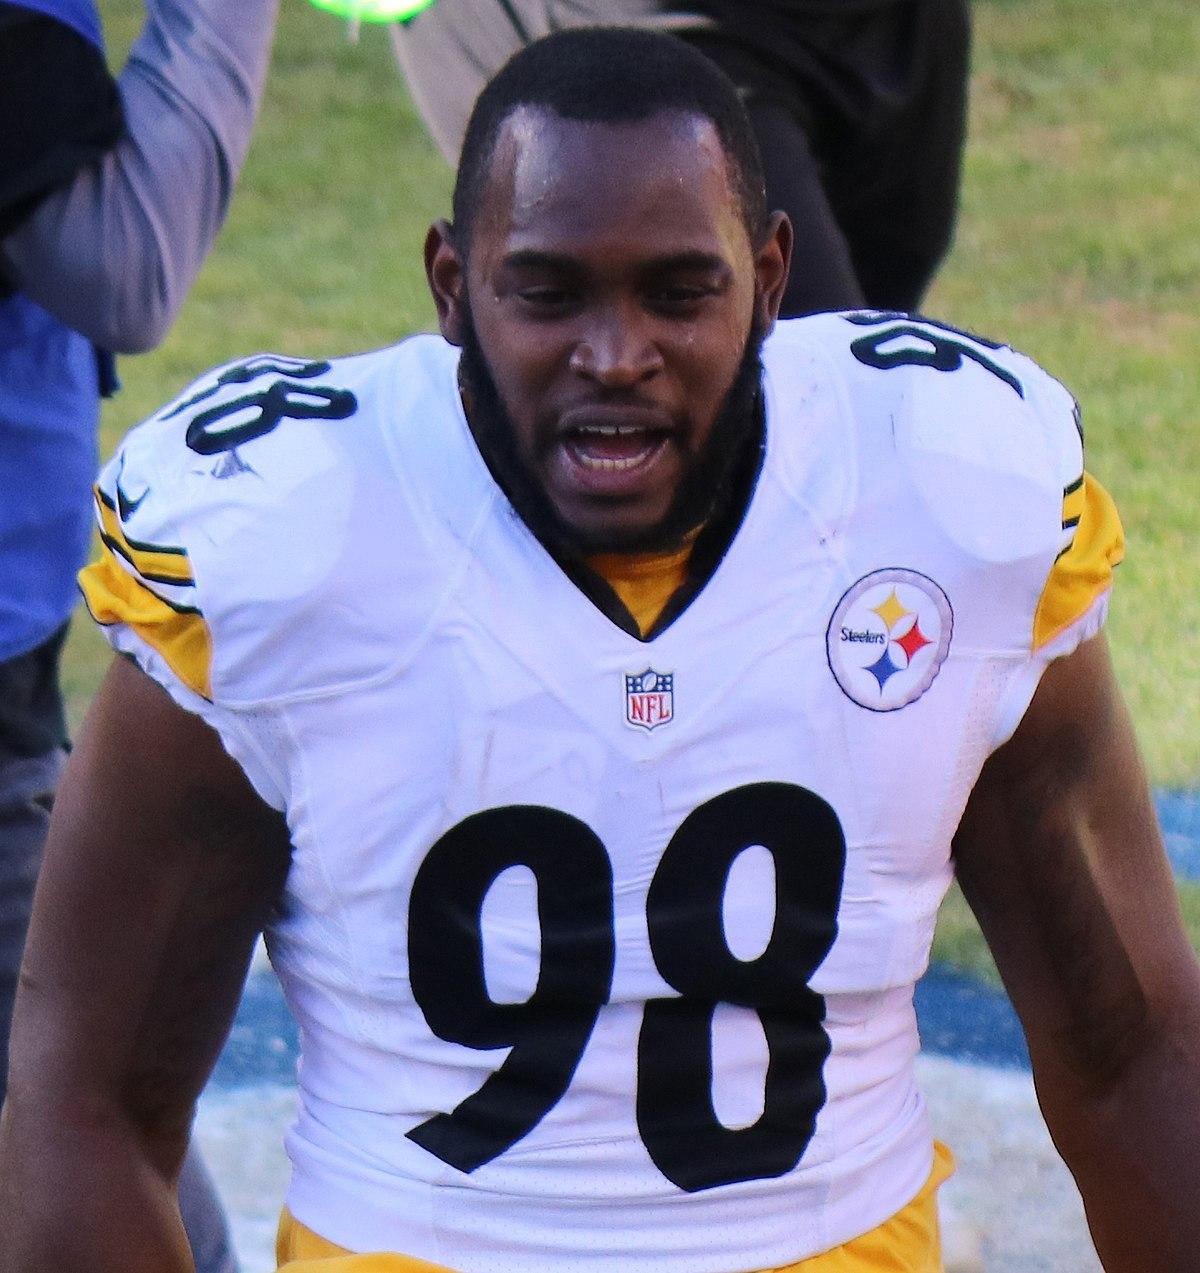 Nicholas Williams Steelers